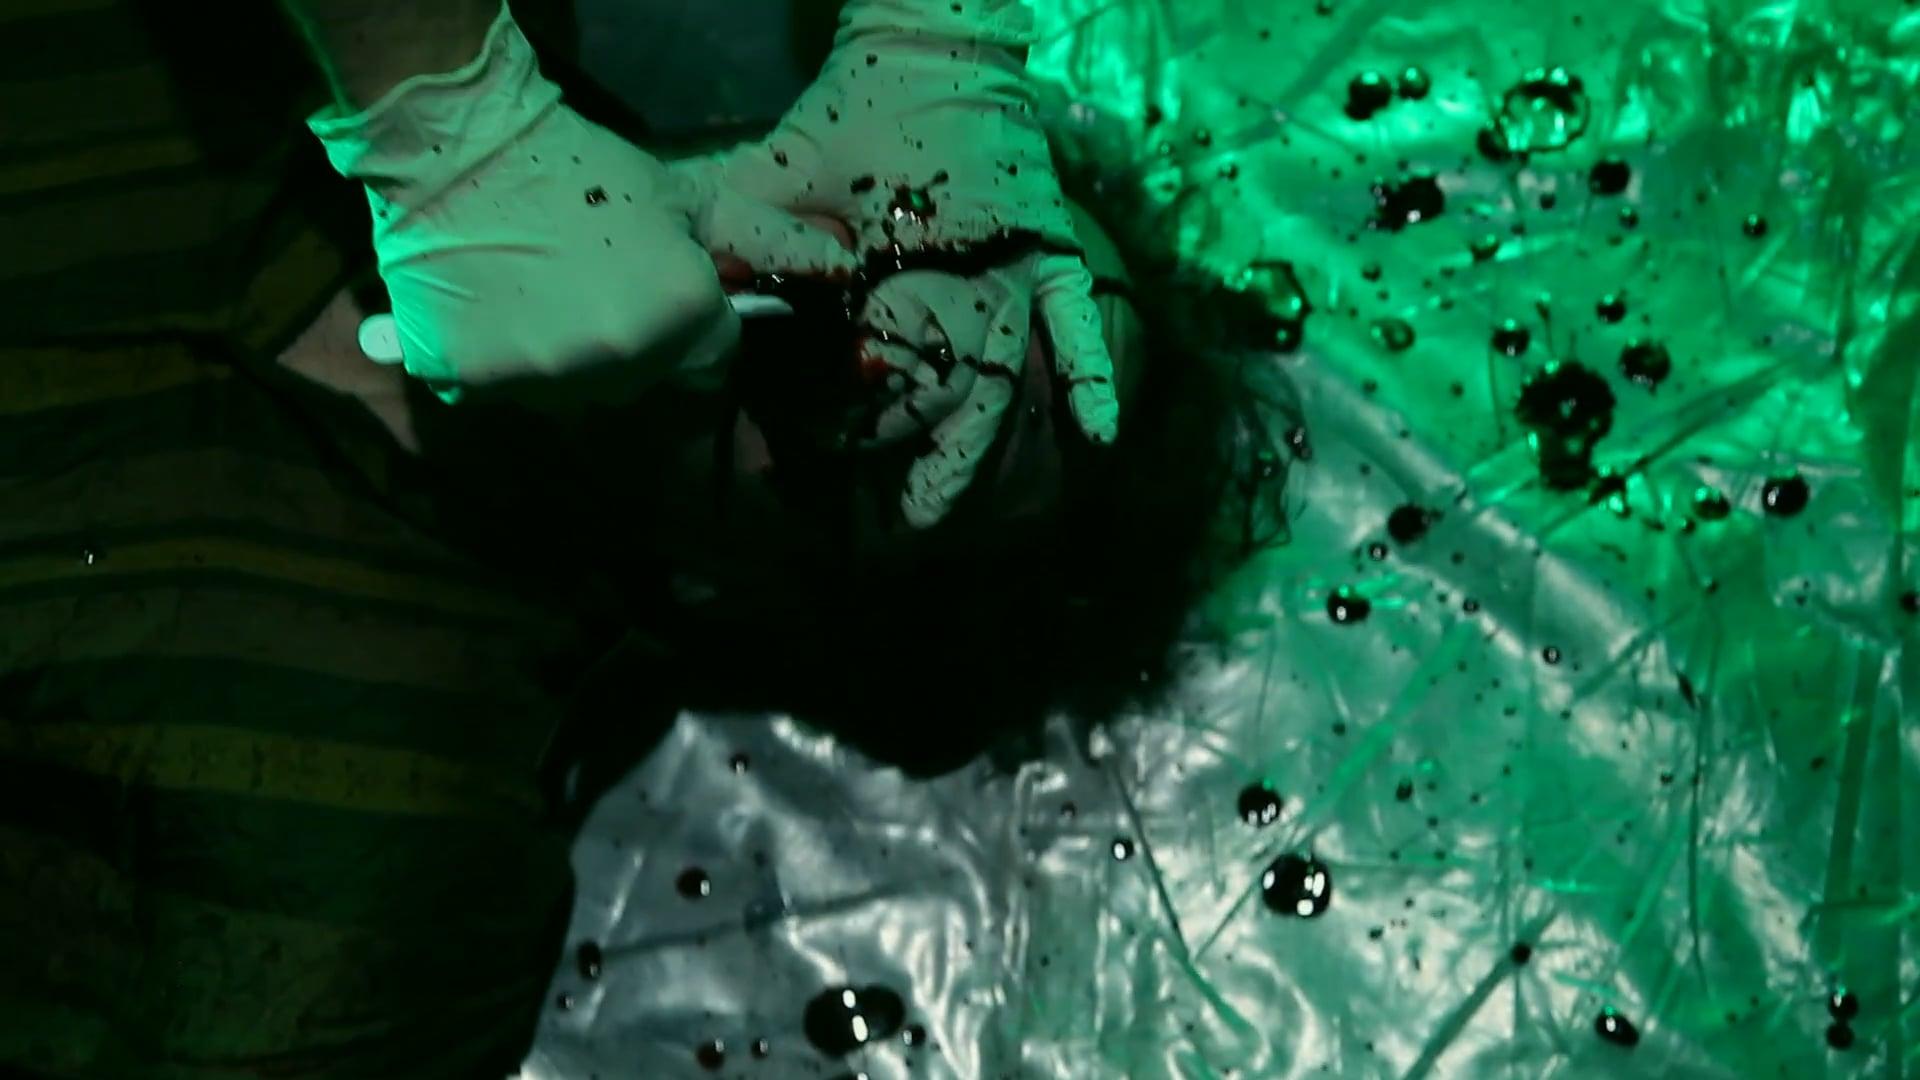 Purificados - Trailer #1